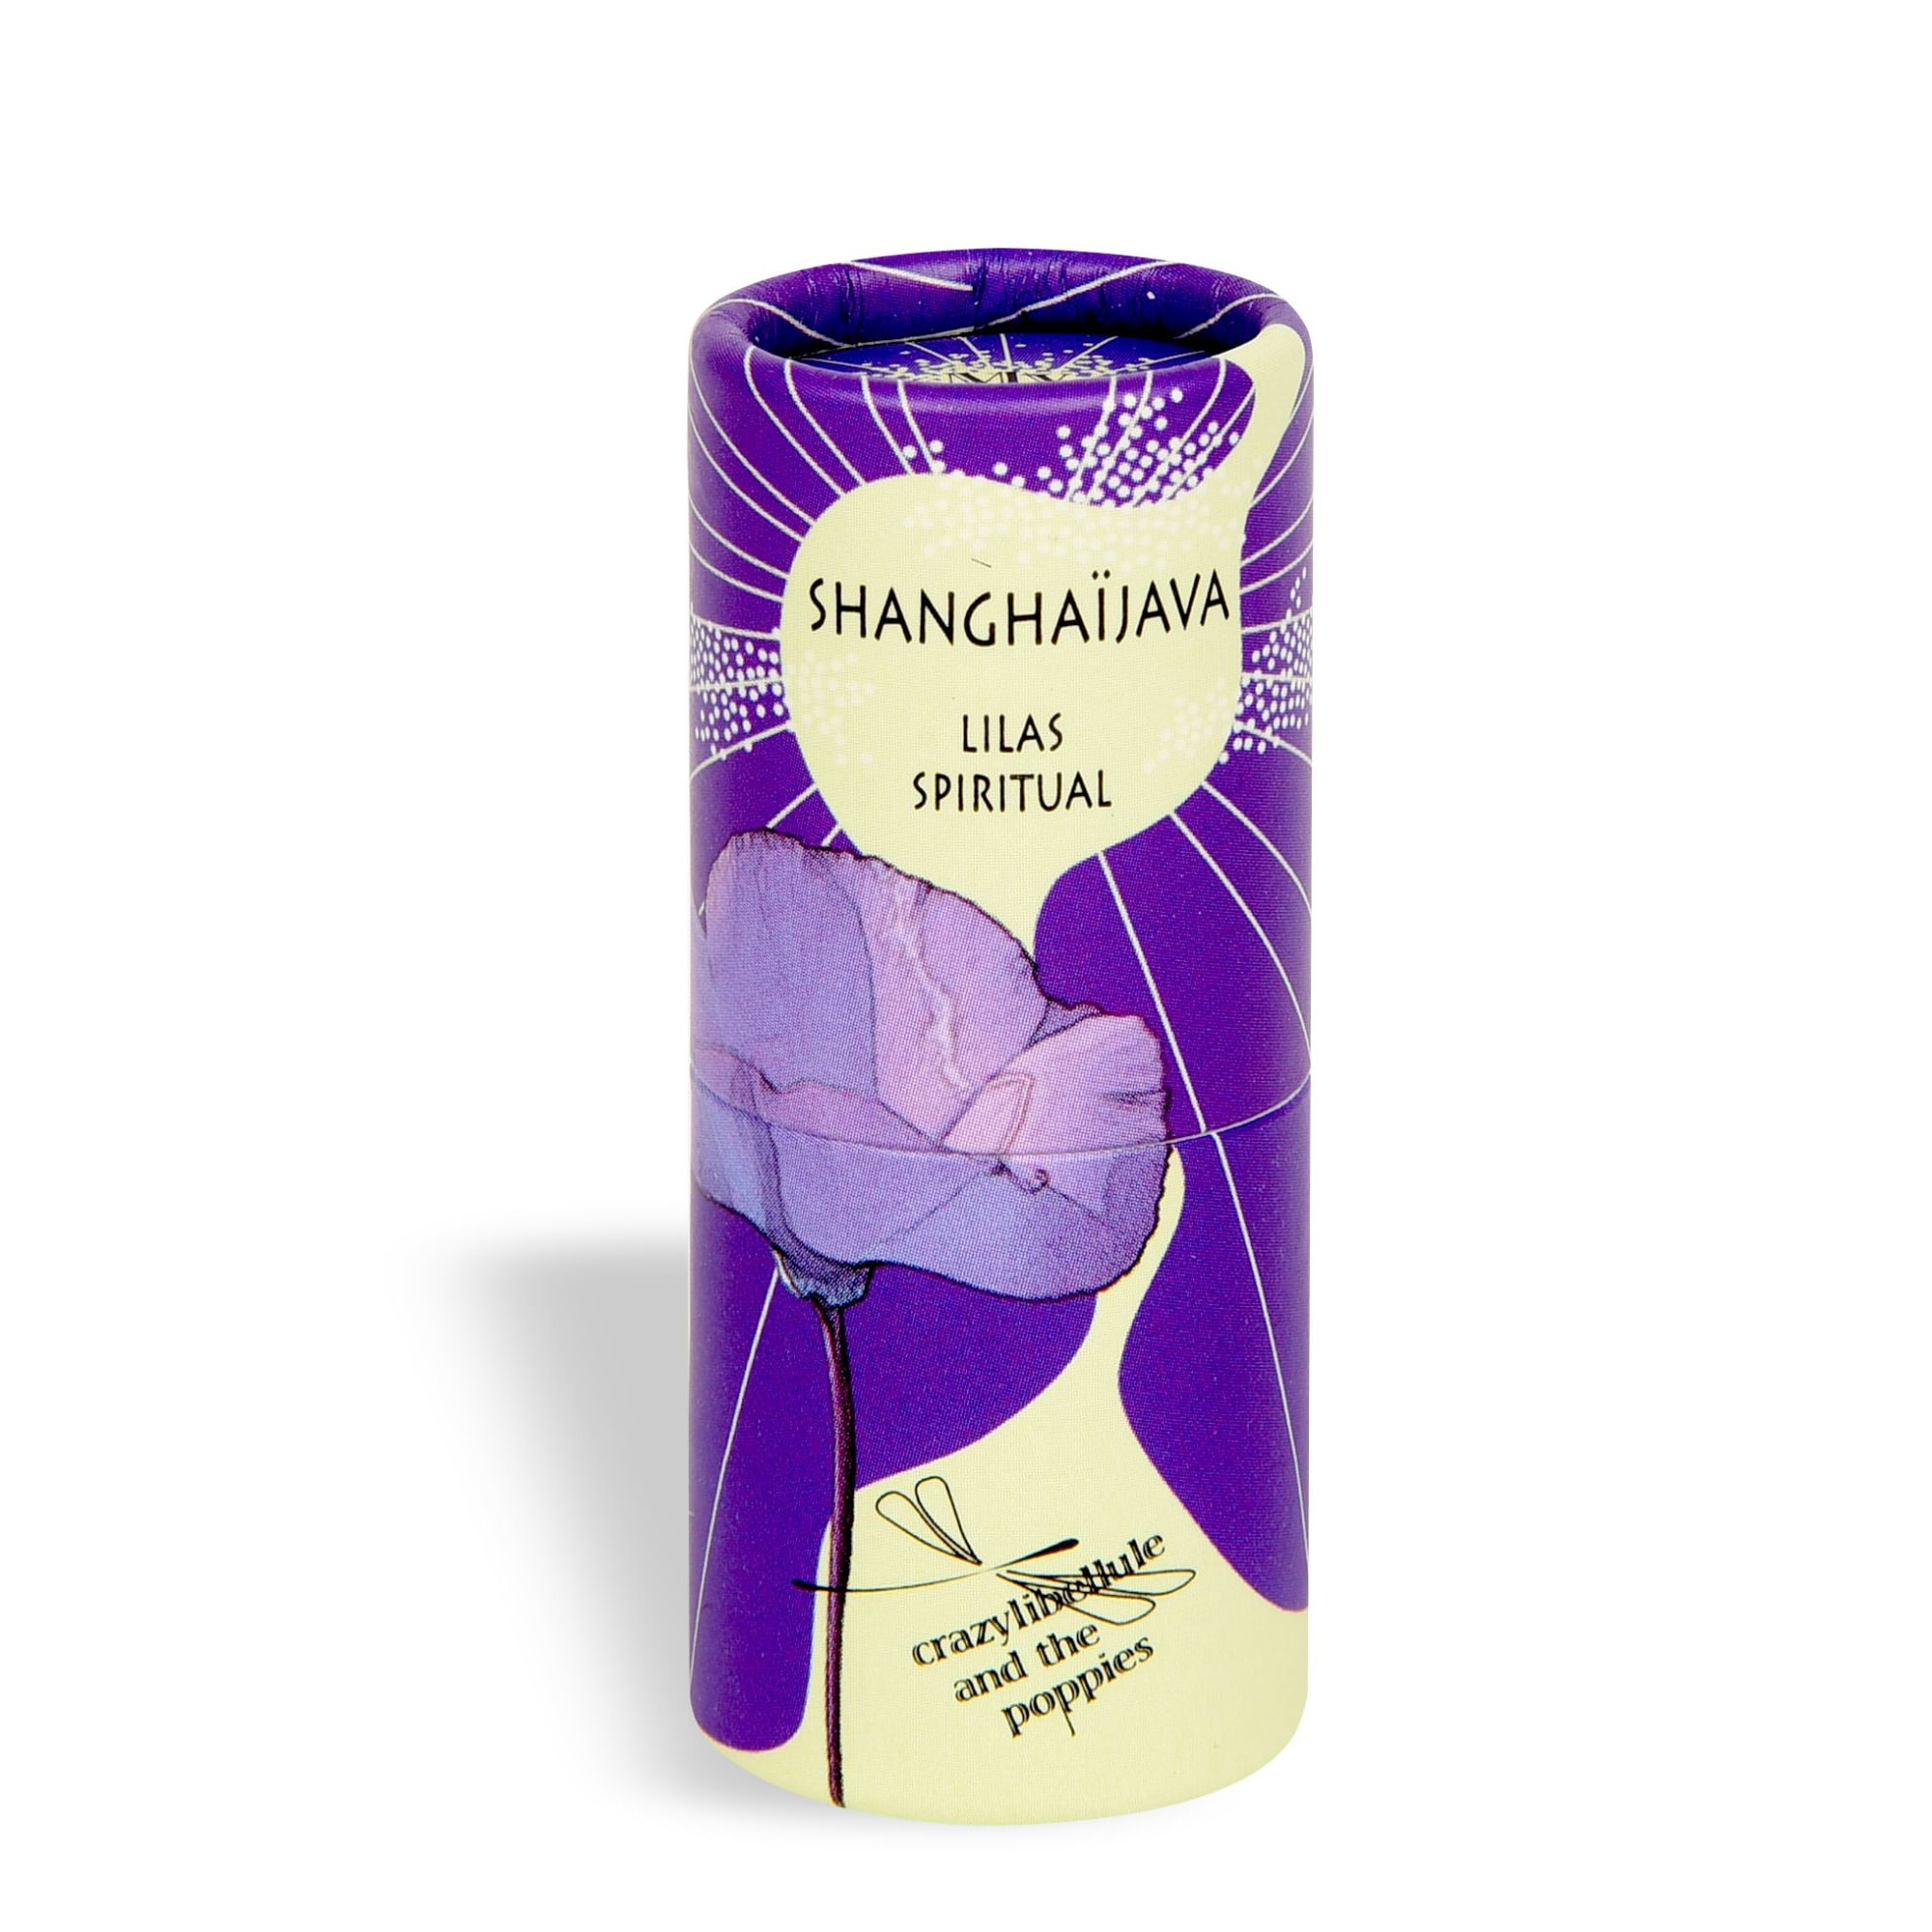 Miniature parfum CRAZYLIBELLULE AND THE POPPIES